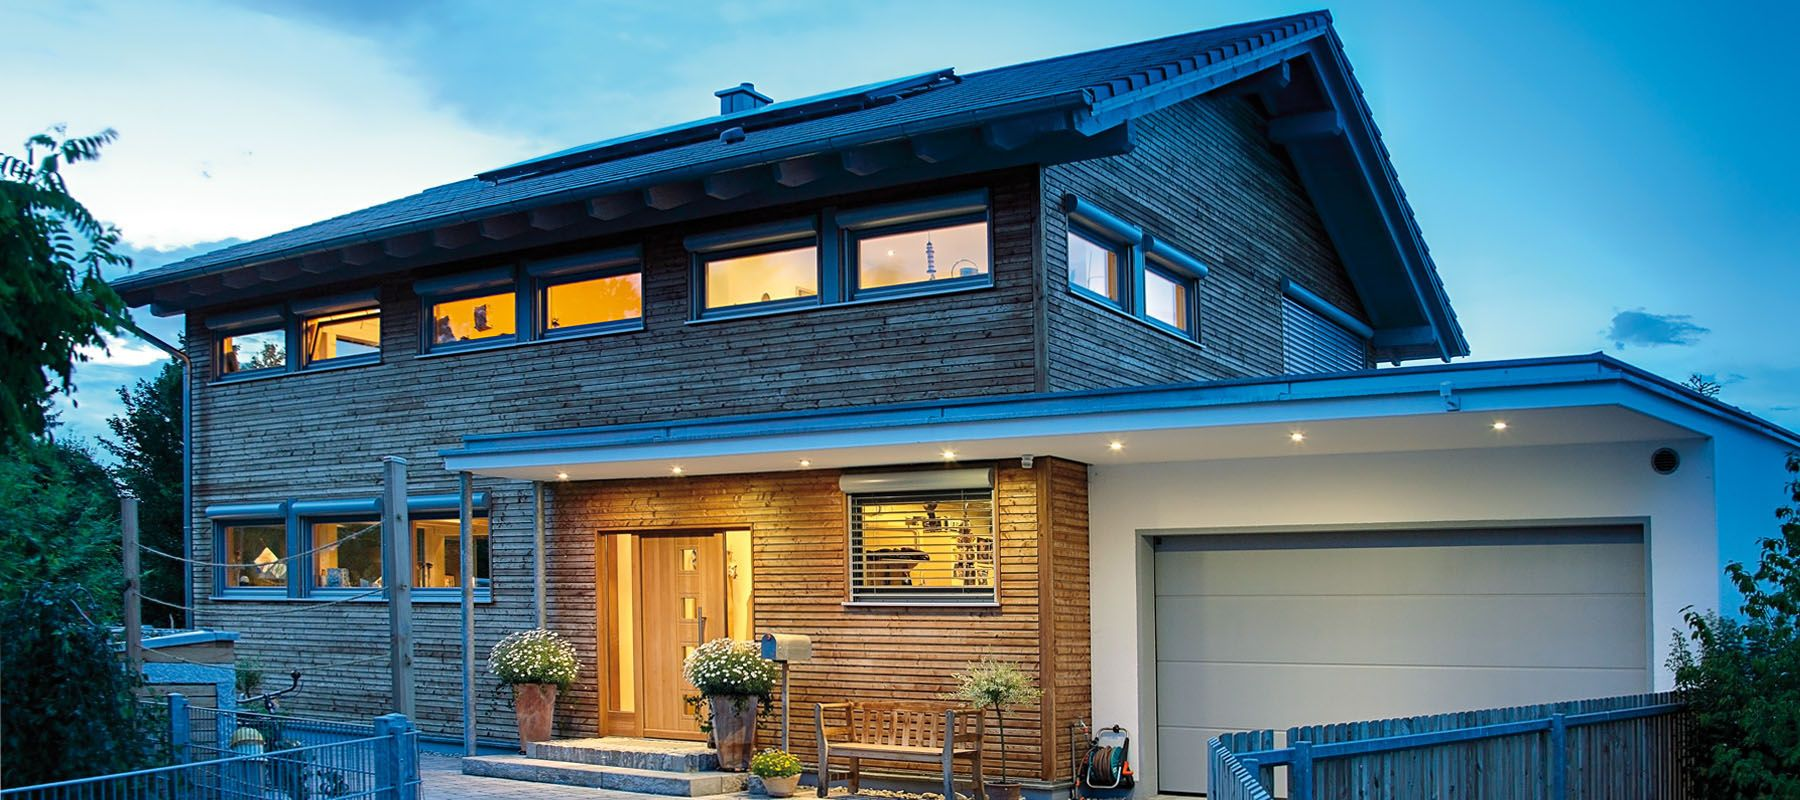 Kundenhaus Augsburg - ein Holzhaus im modernen Stil - Sonnleitner.de ...